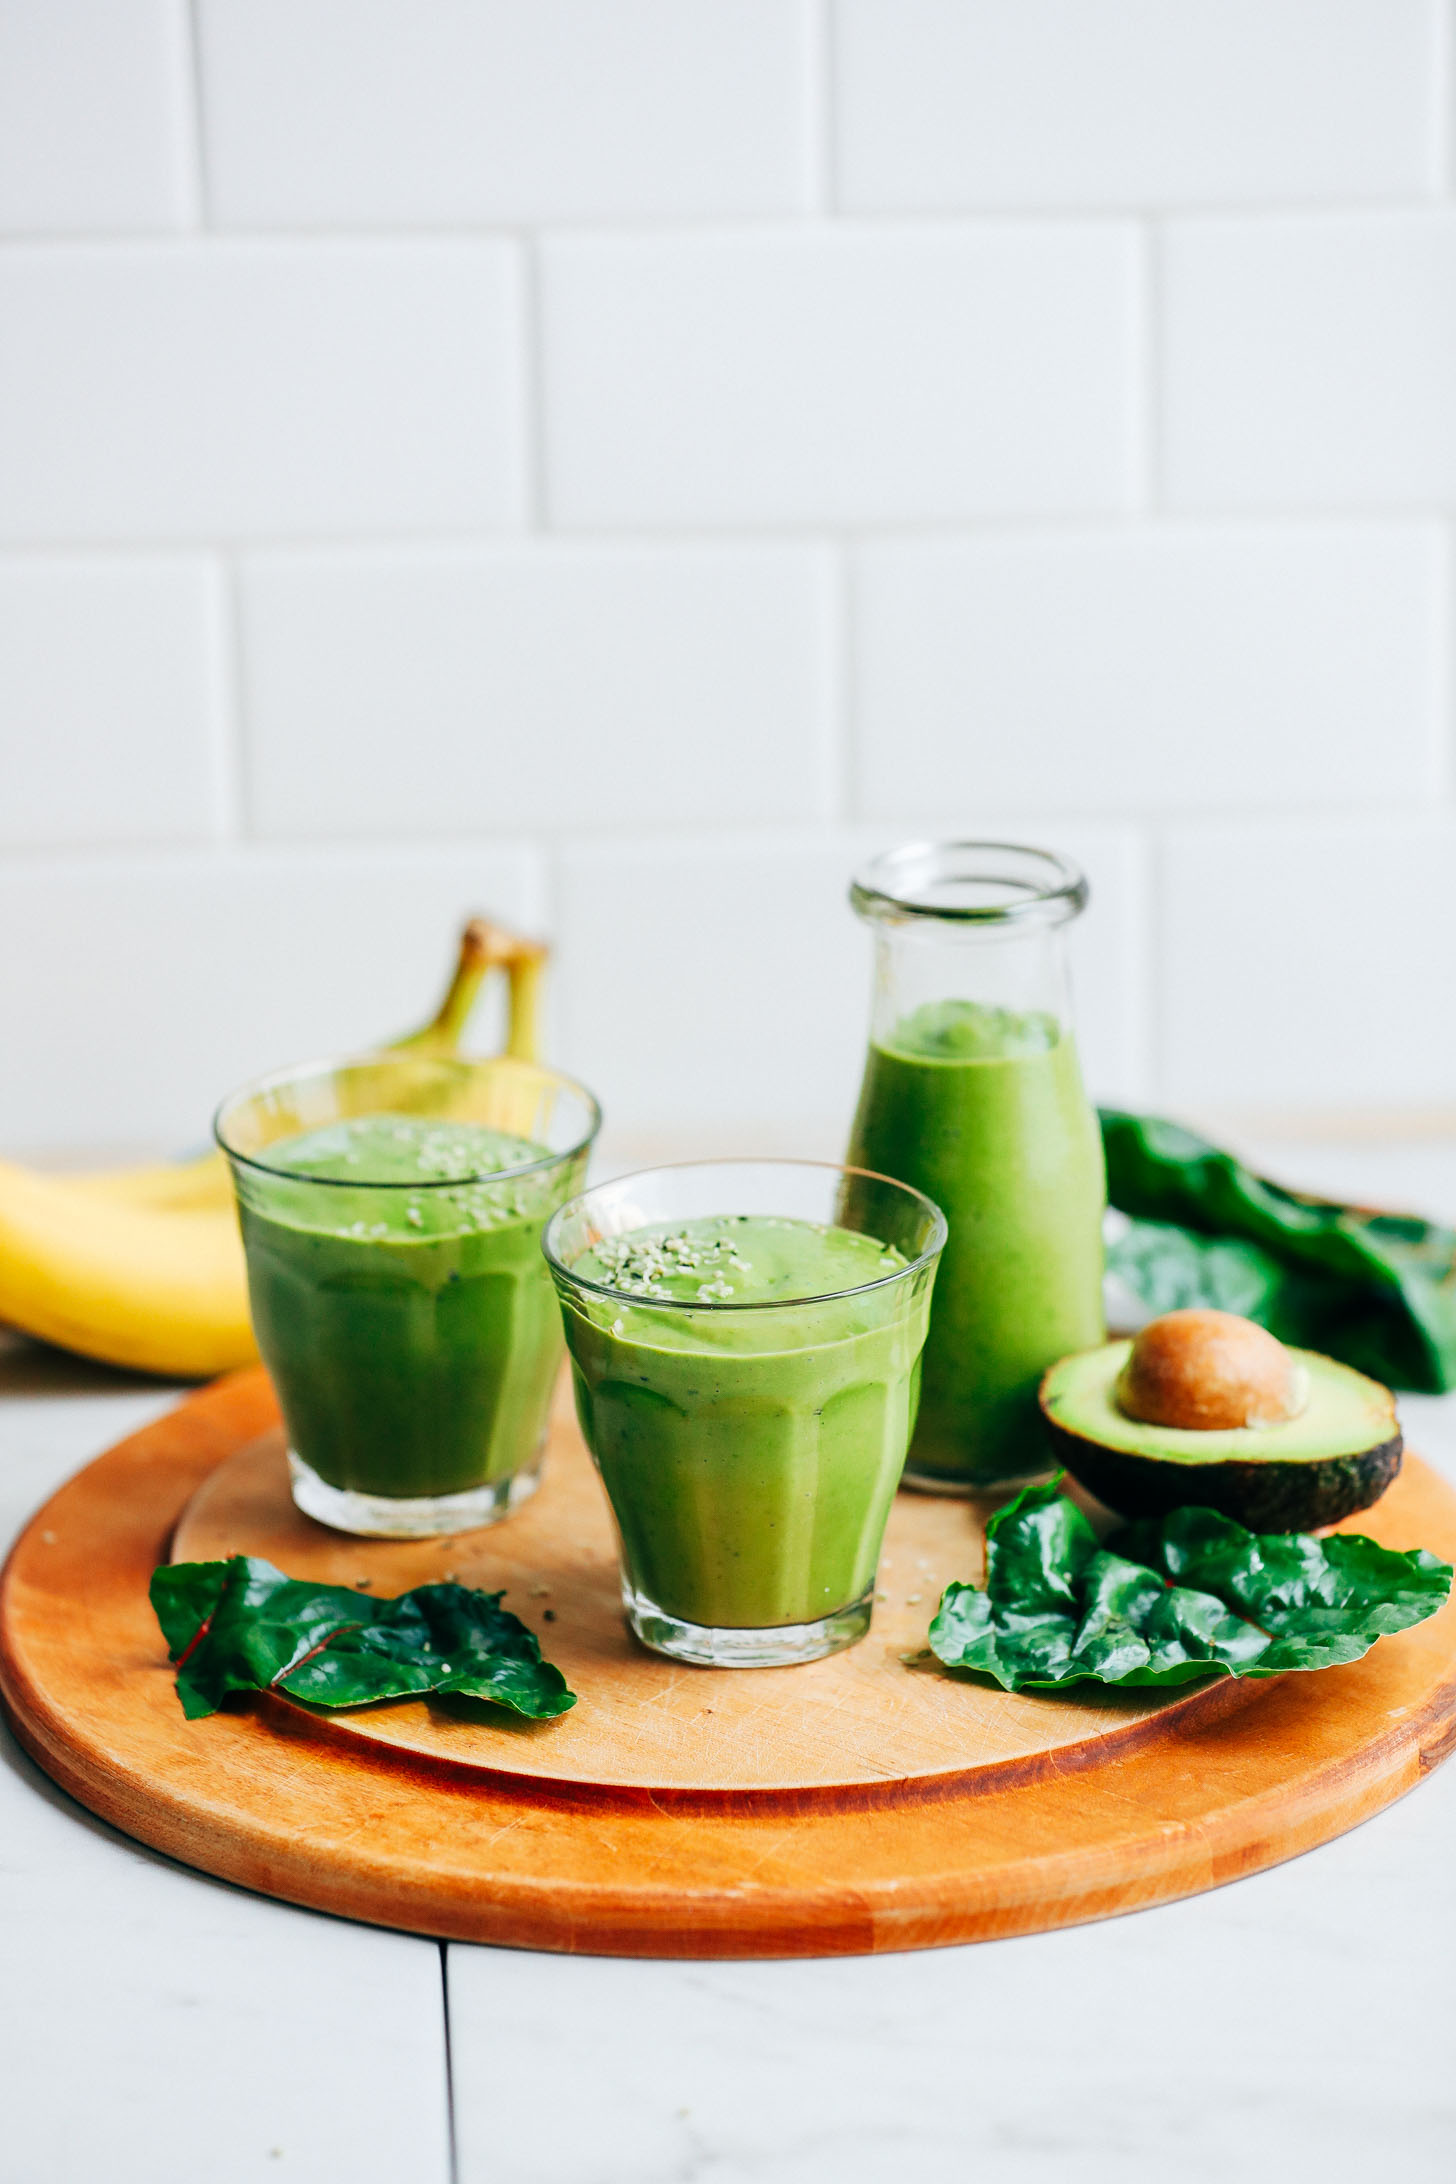 CREAMY-Avocado-Green-Smoothie-5-ingredients-GREEN-SO-healthy-satisfying-vegan-banana-plantbased-smoothie-greensmoothie-avocado-glutenfree-179.jpg